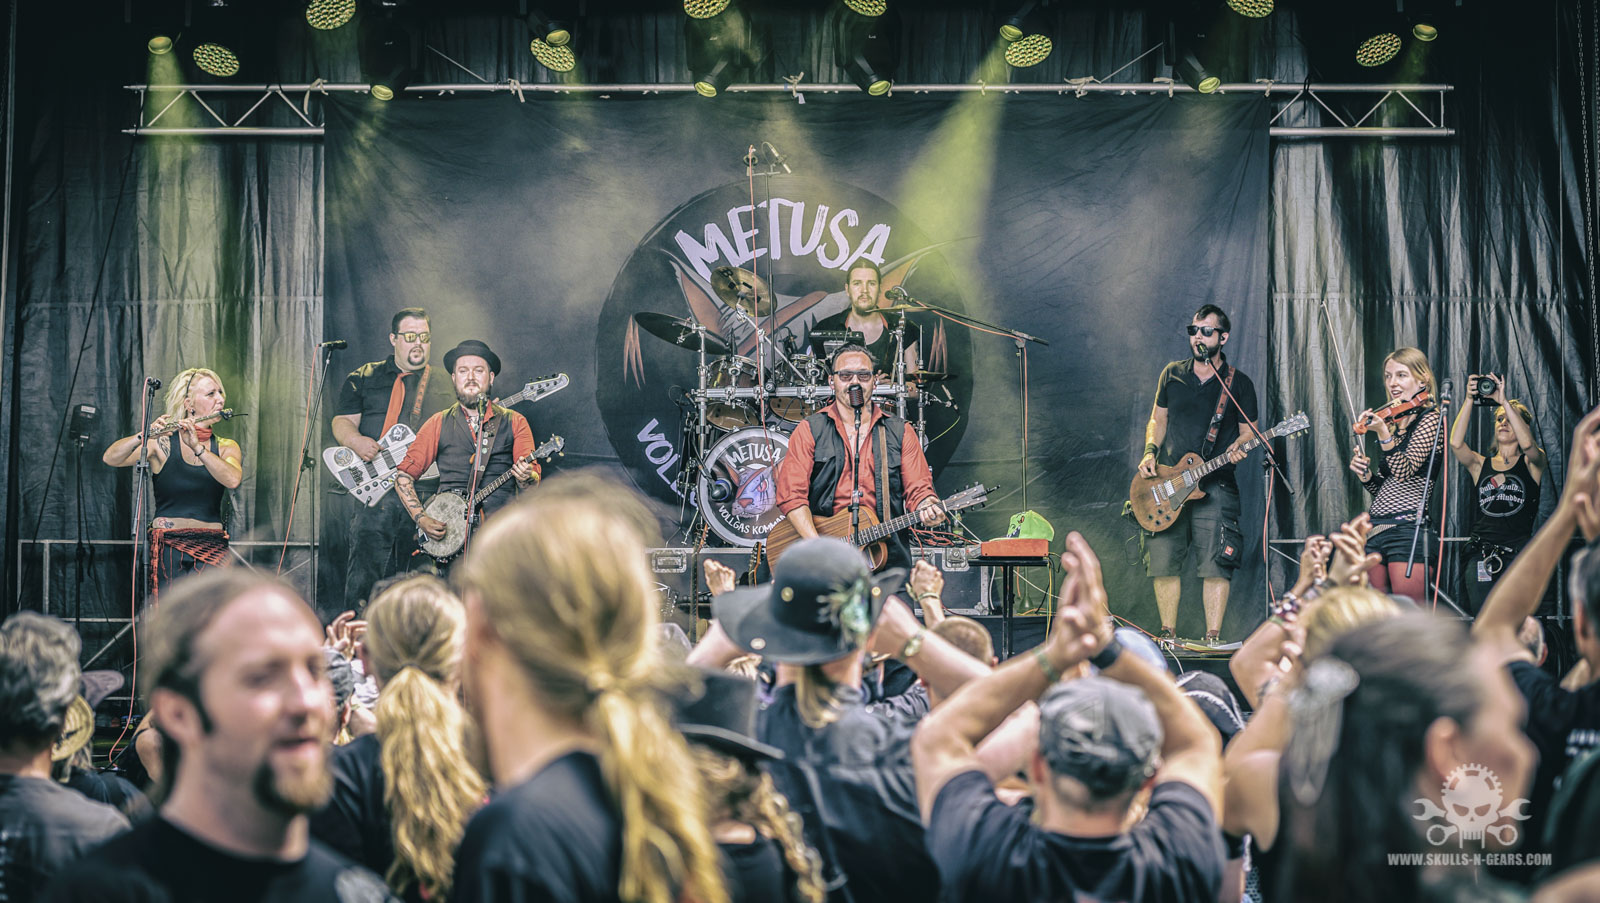 Schlosshof Festival - Metusa -15